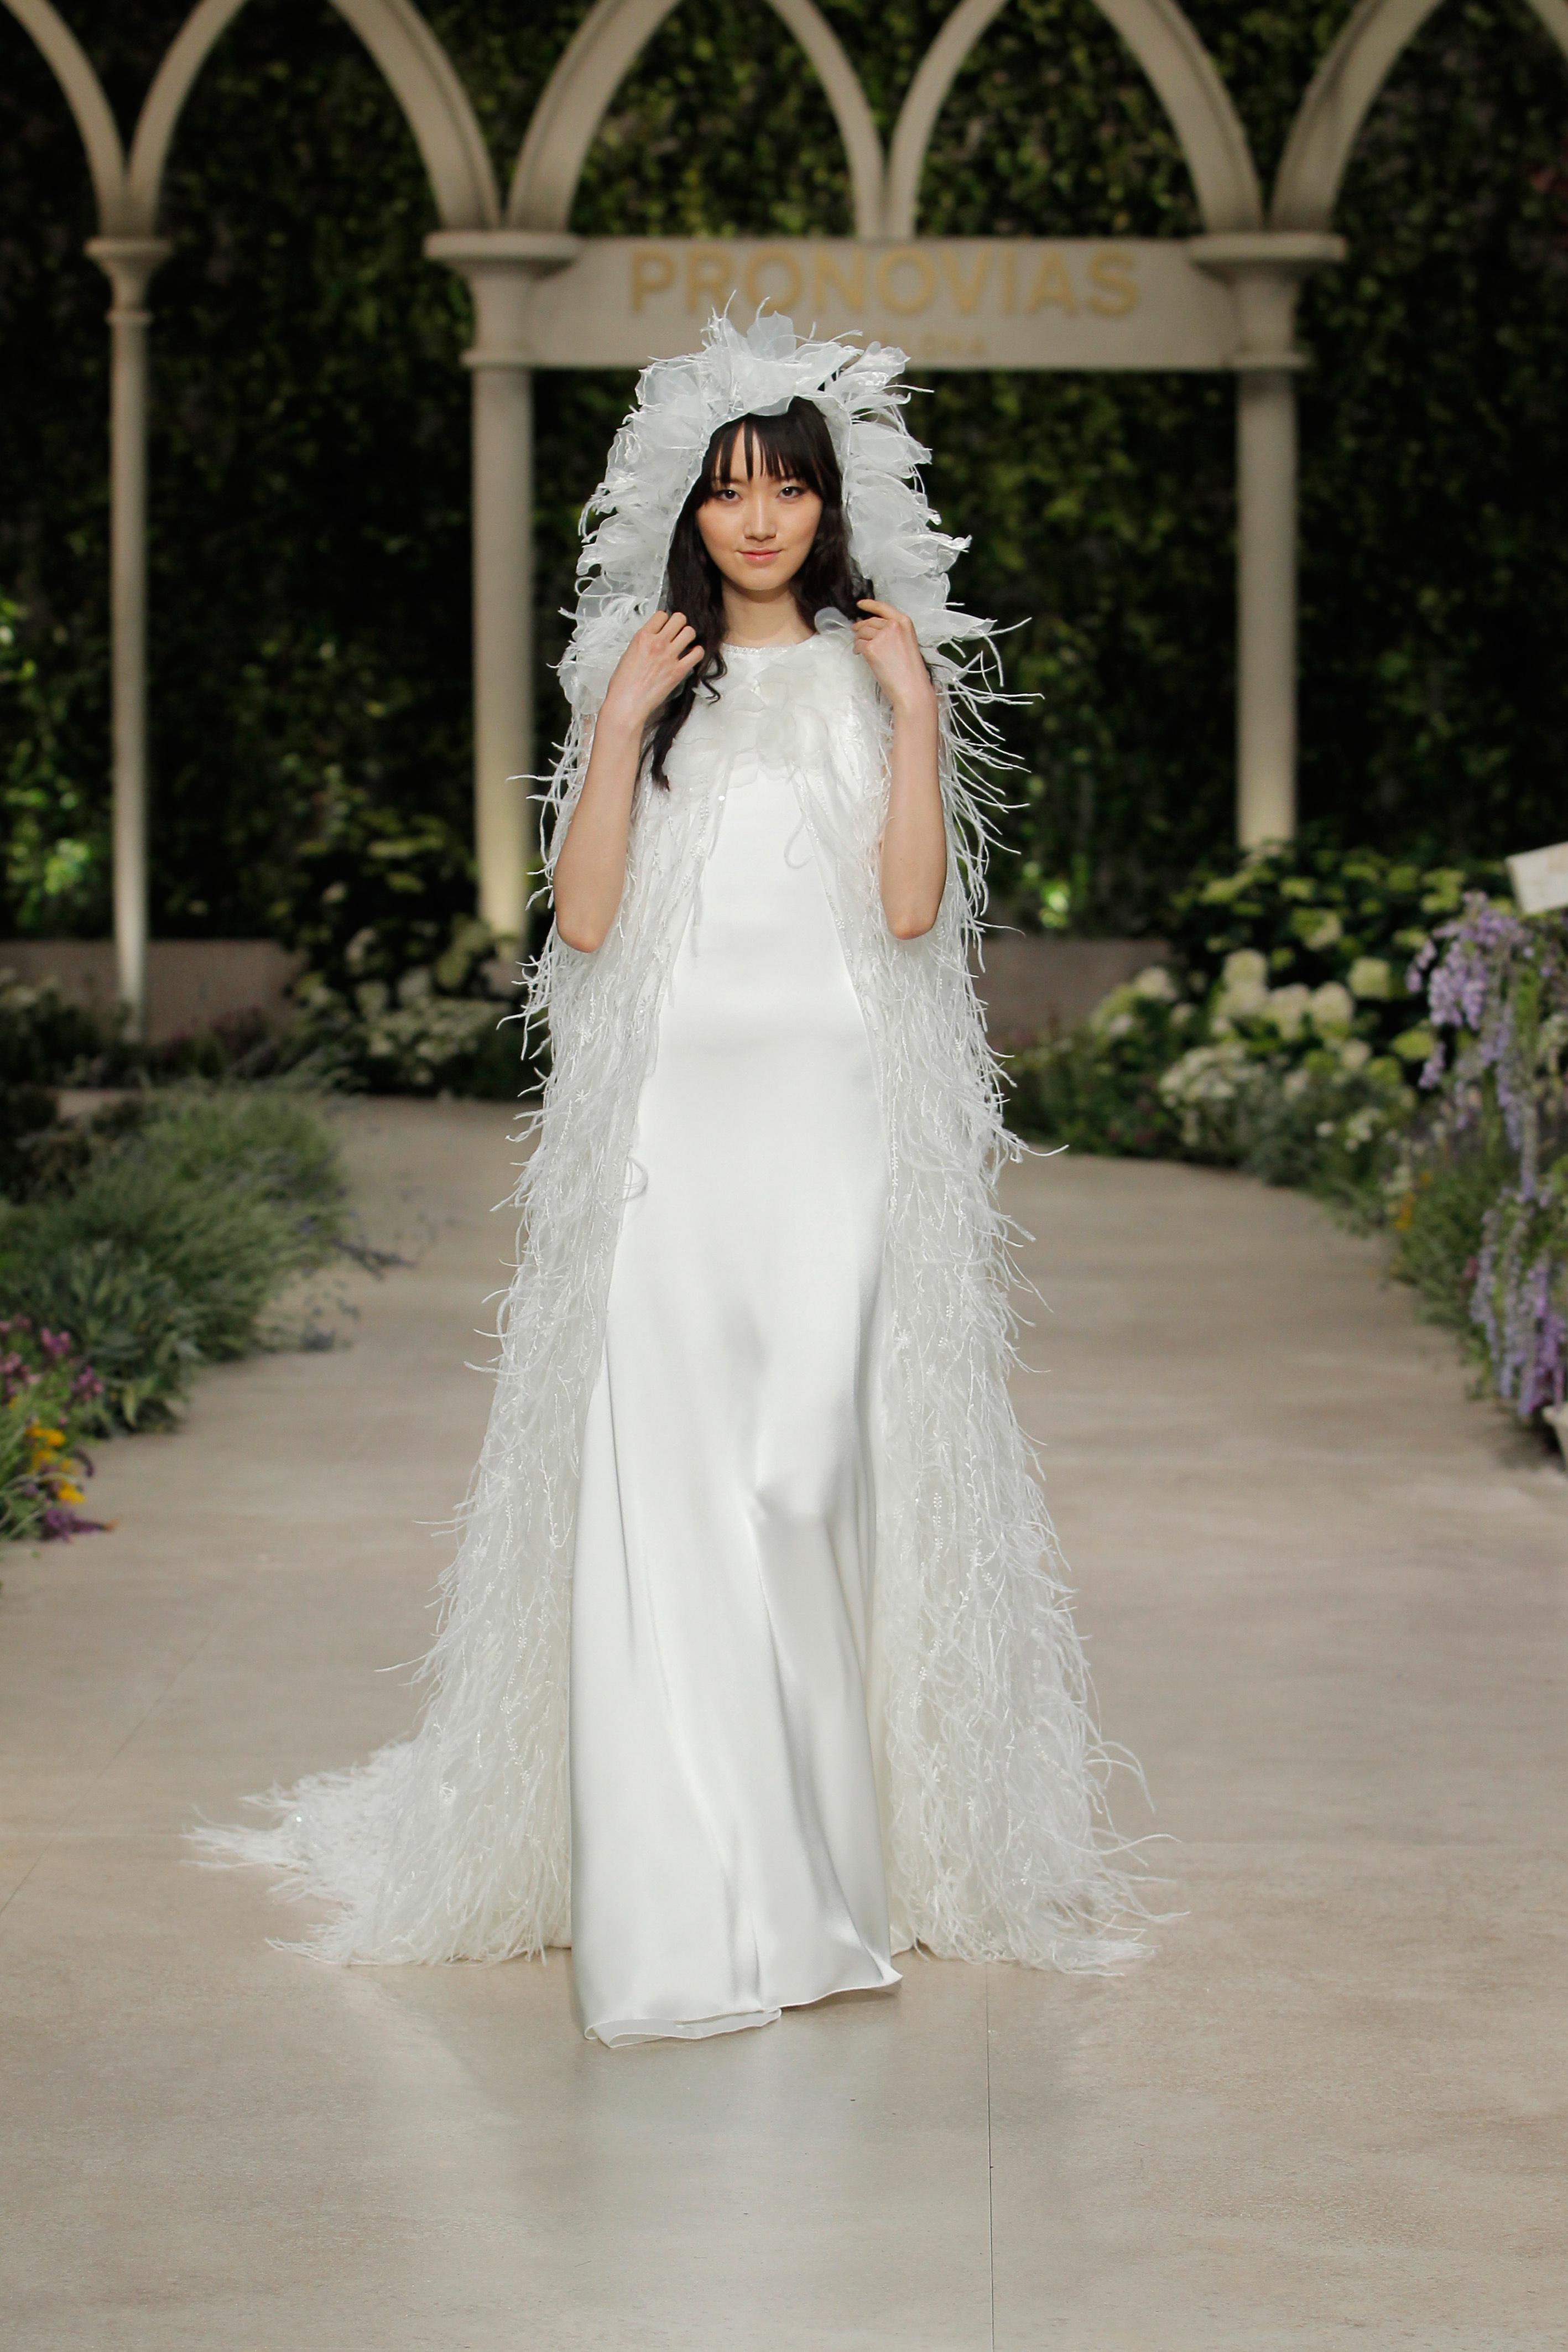 pronovias wedding dress spring 2019 feather veil sheath